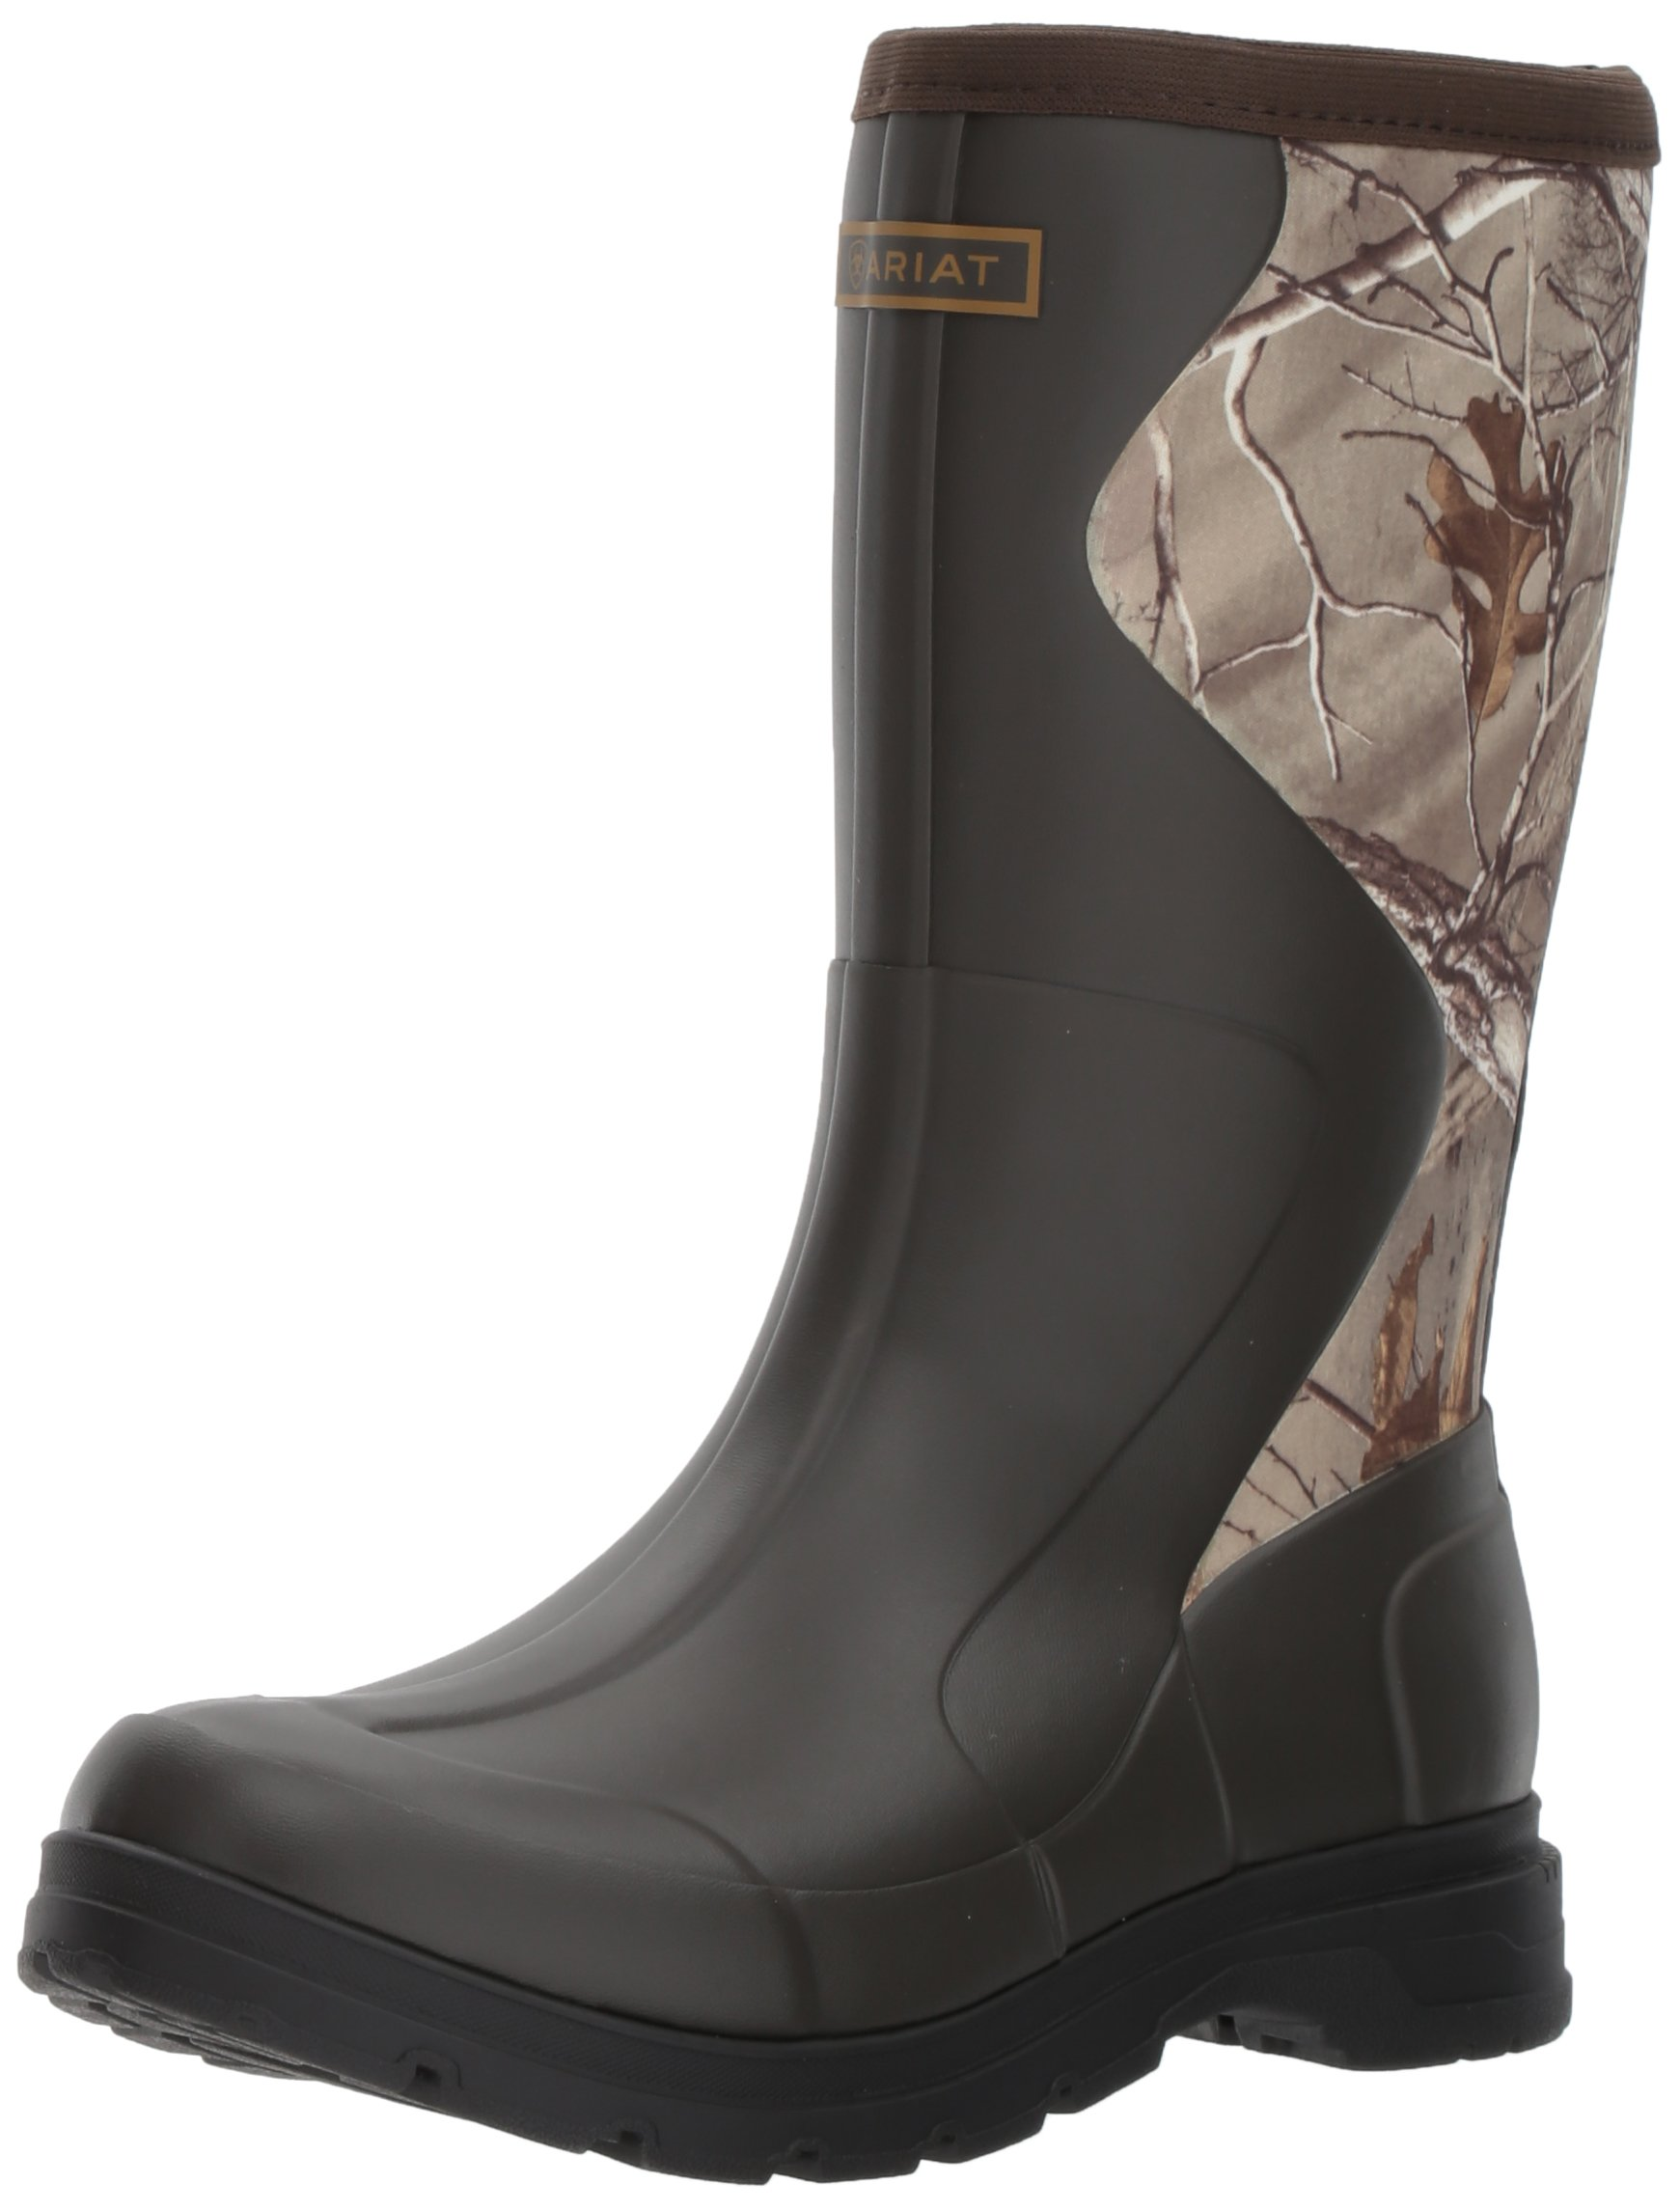 Ariat Women's Springfield Rubber Work Boot, Dark Brown, 9 B US